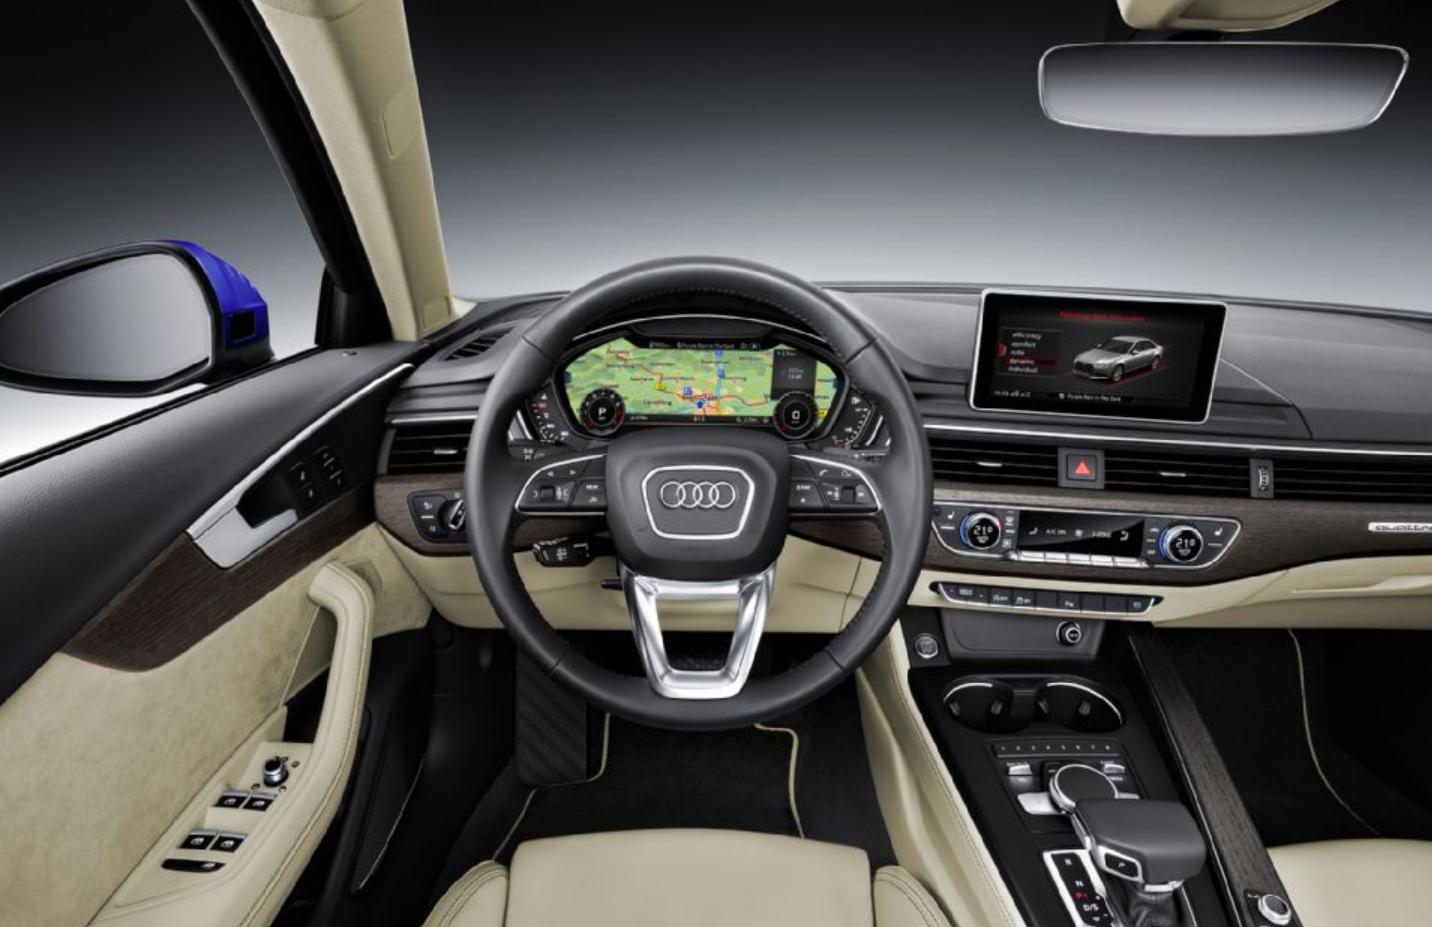 2017 Audi A4 Interior Audi A4 Audi A4 Avant Audi